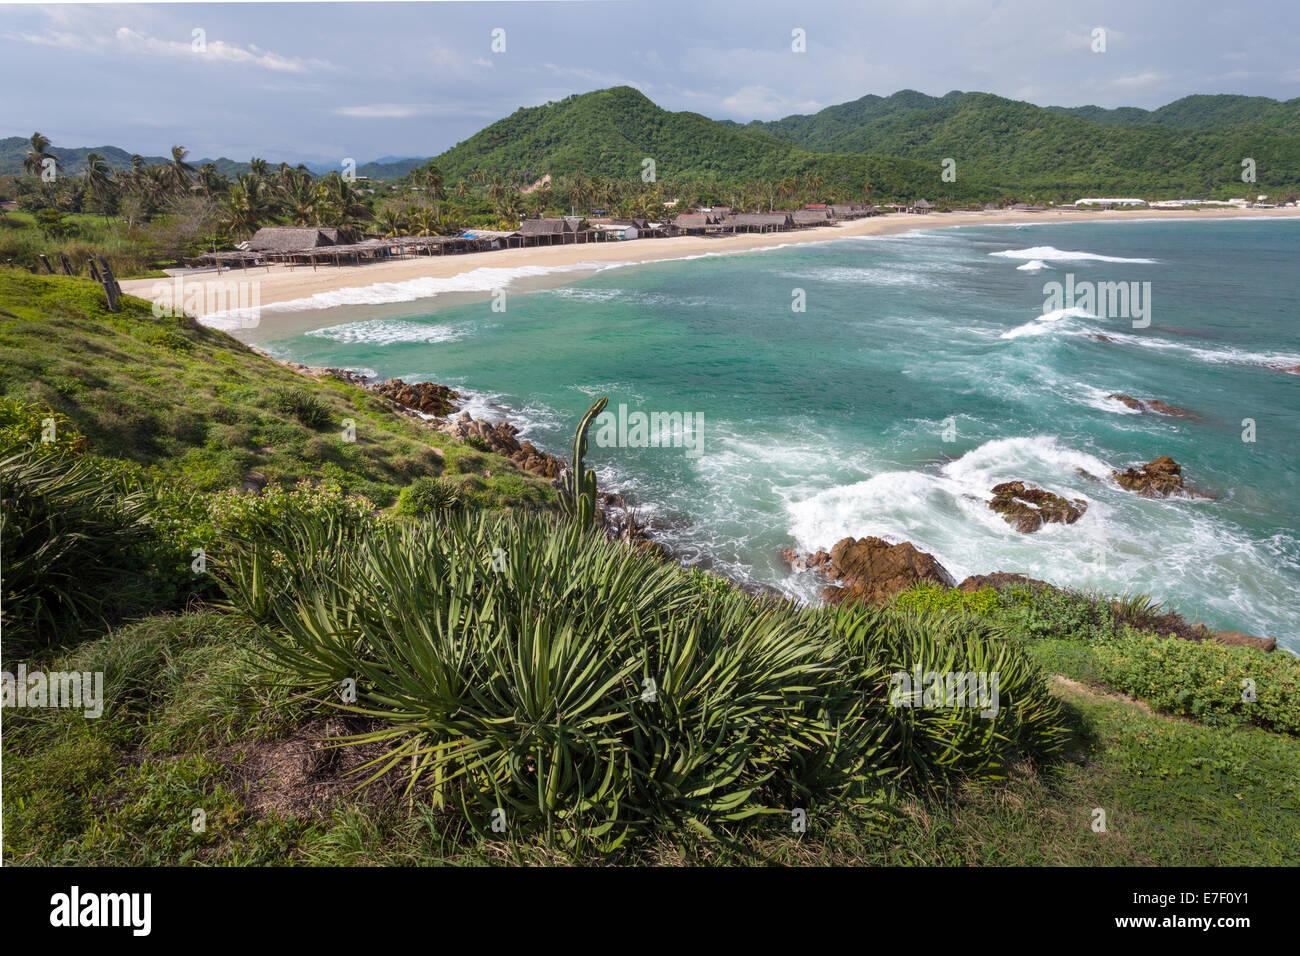 Beach and palapas of Maruata, Michoacan, Mexico. - Stock Image